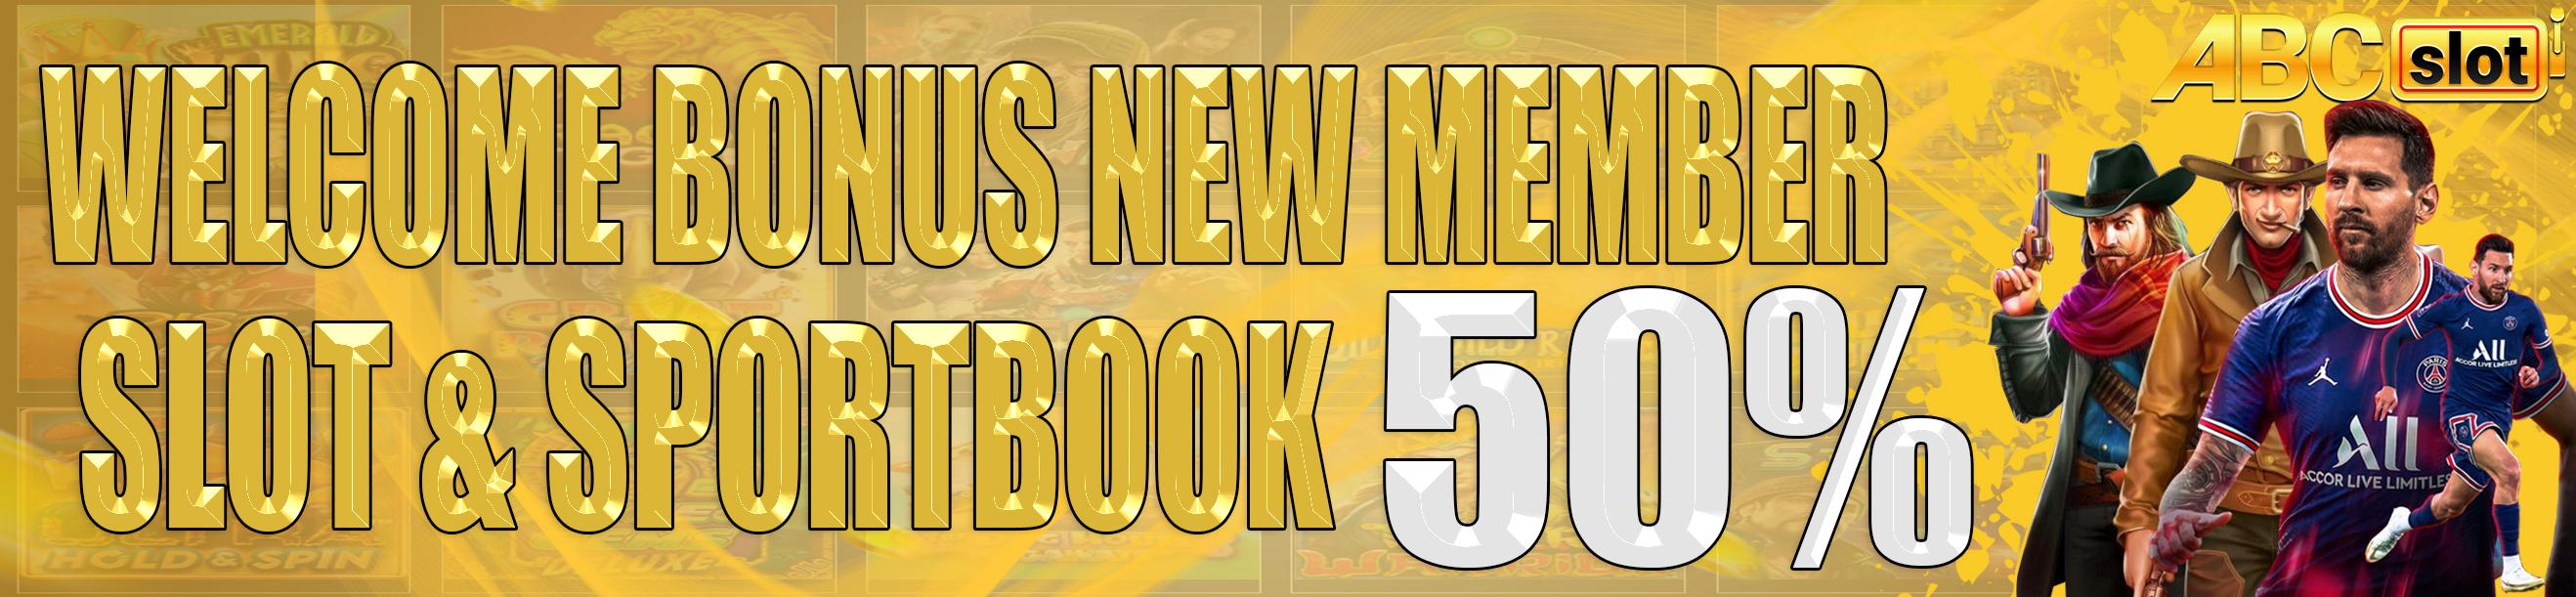 WELCOME BONUS NEW MEMBER 50% SLOT & SPORTBOOK